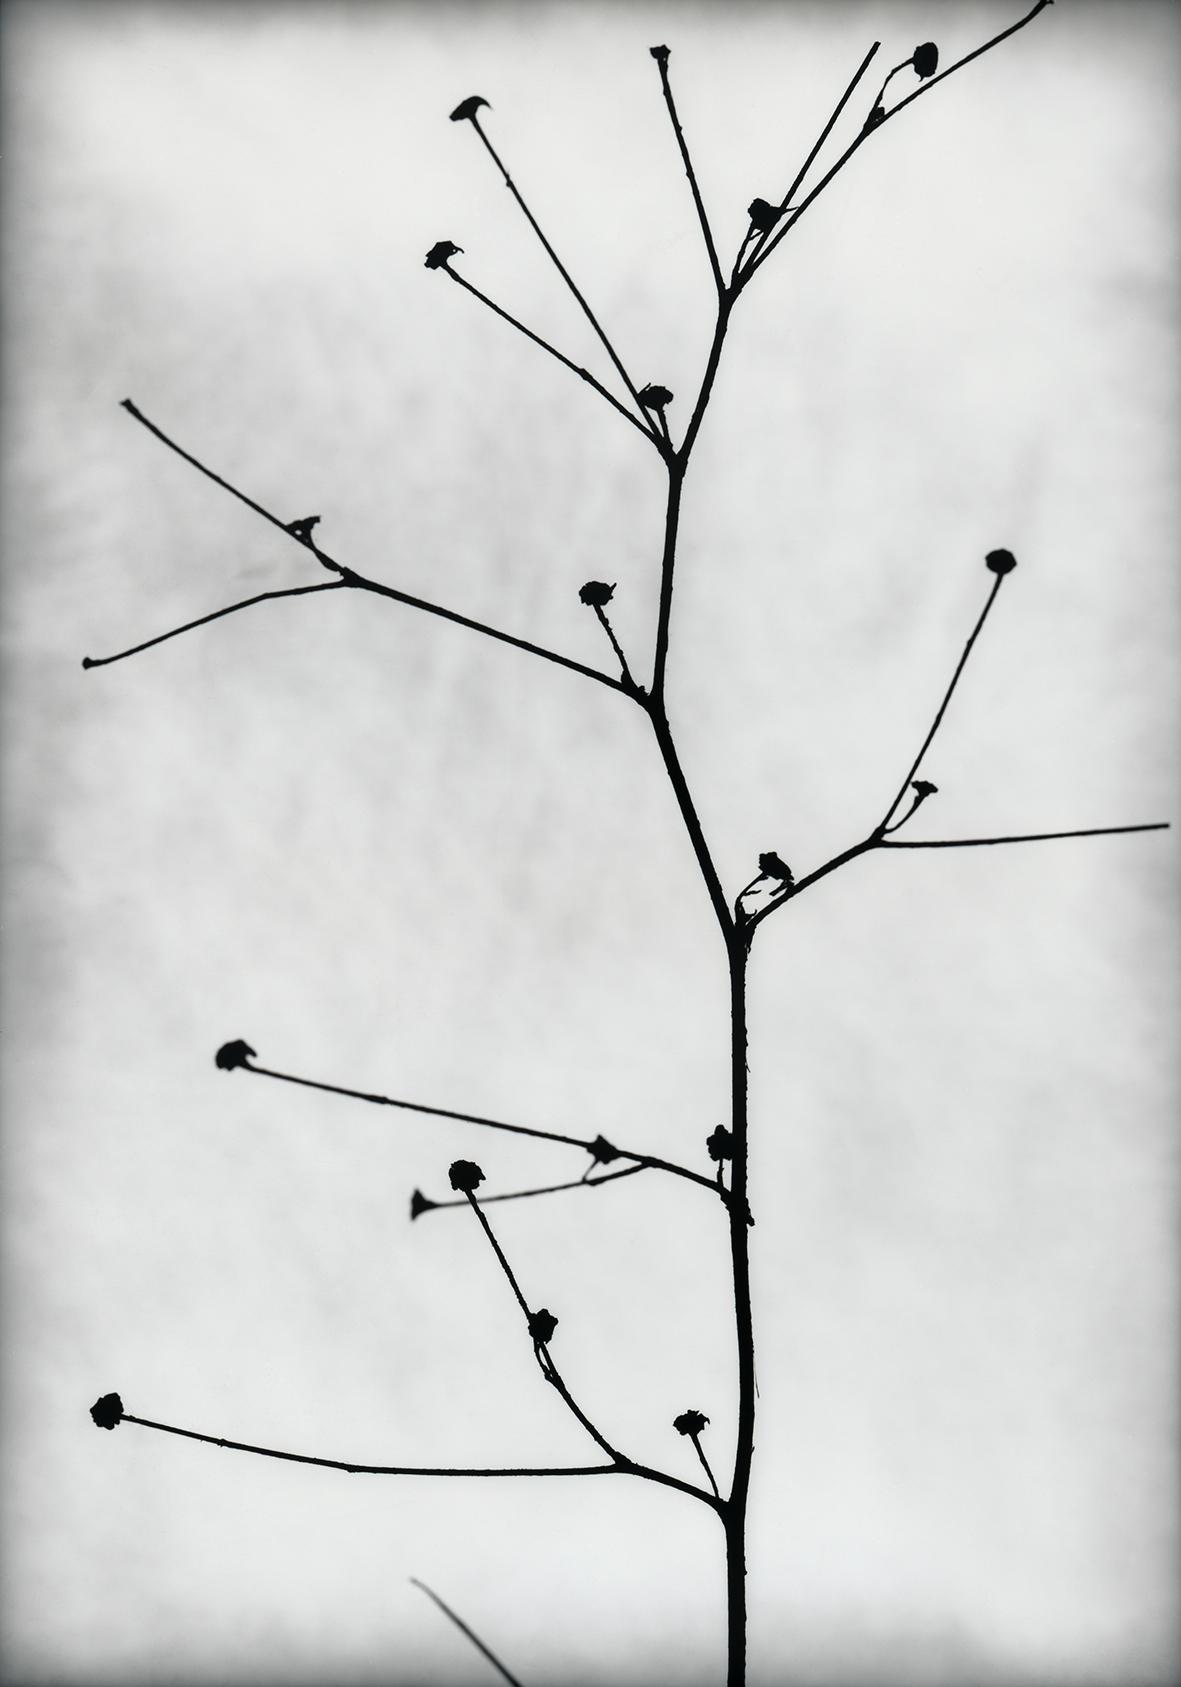 Intervalo lúcido. Consciencias del espacio (2020) - Ana Frechilla